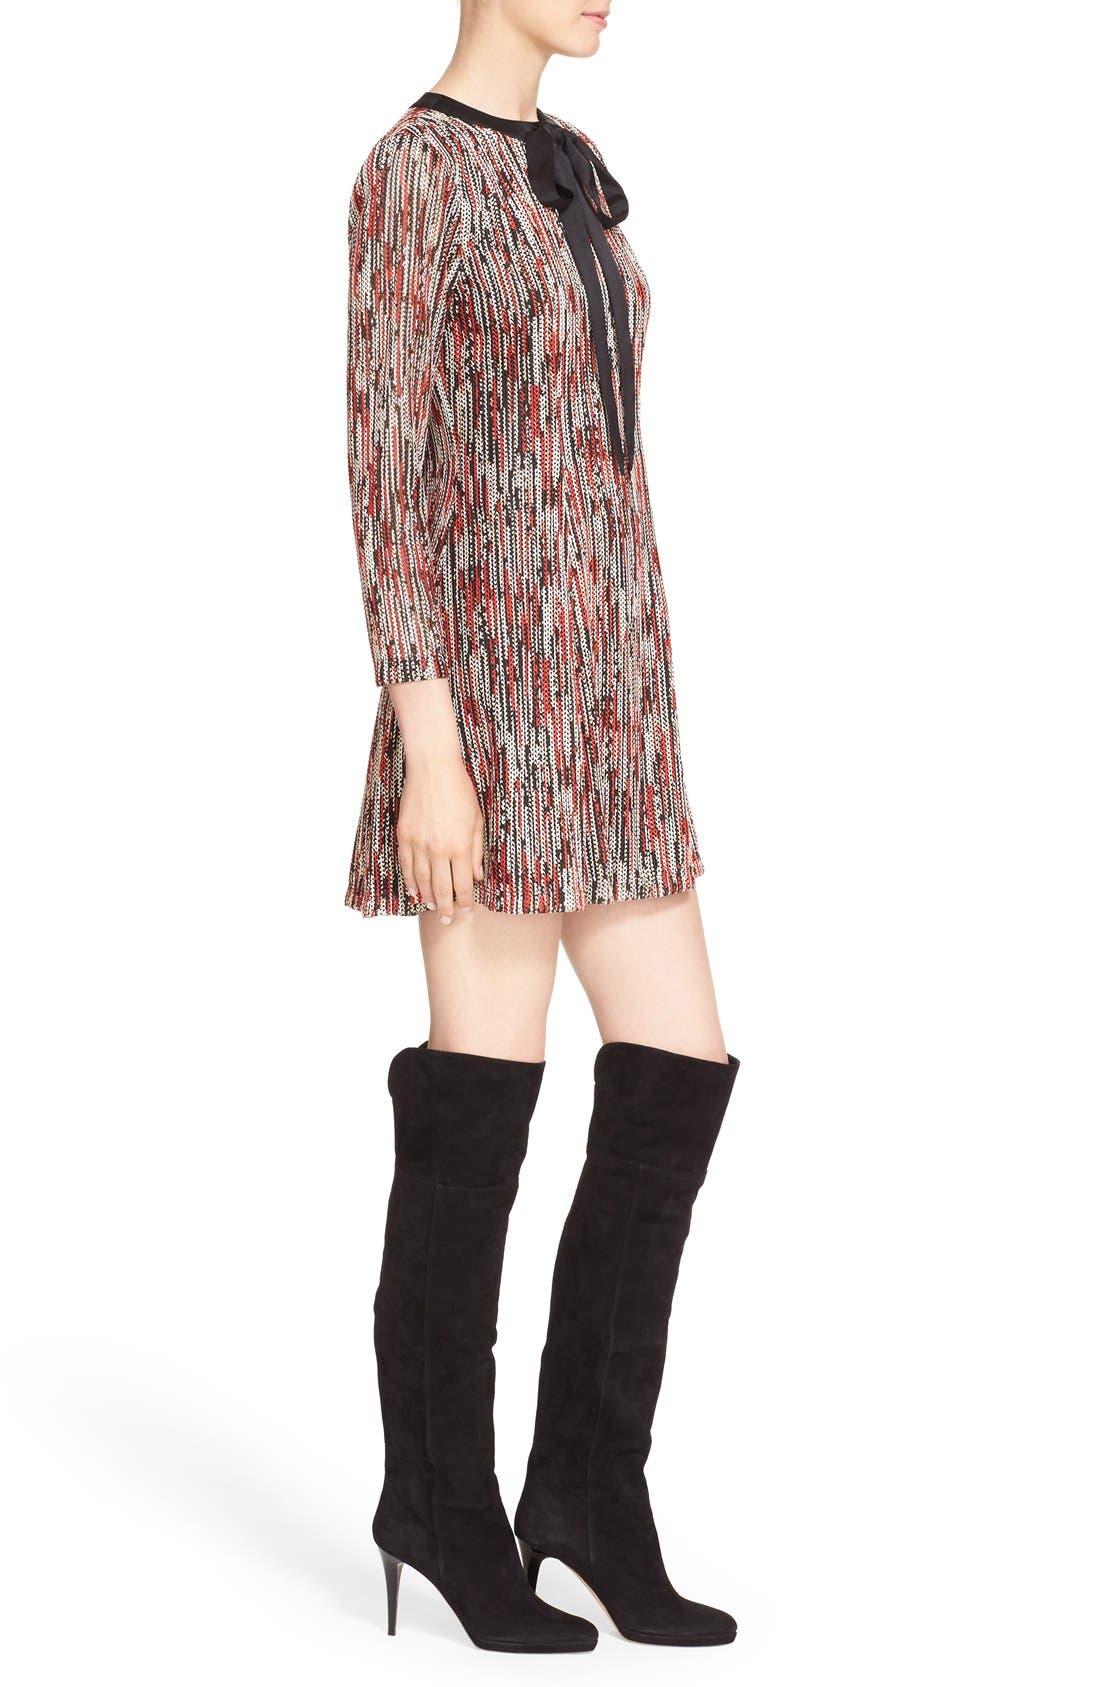 Alternate Image 3  - Alice + Olivia 'Gwyneth' Print Tie Neck Fit & Flare Dress